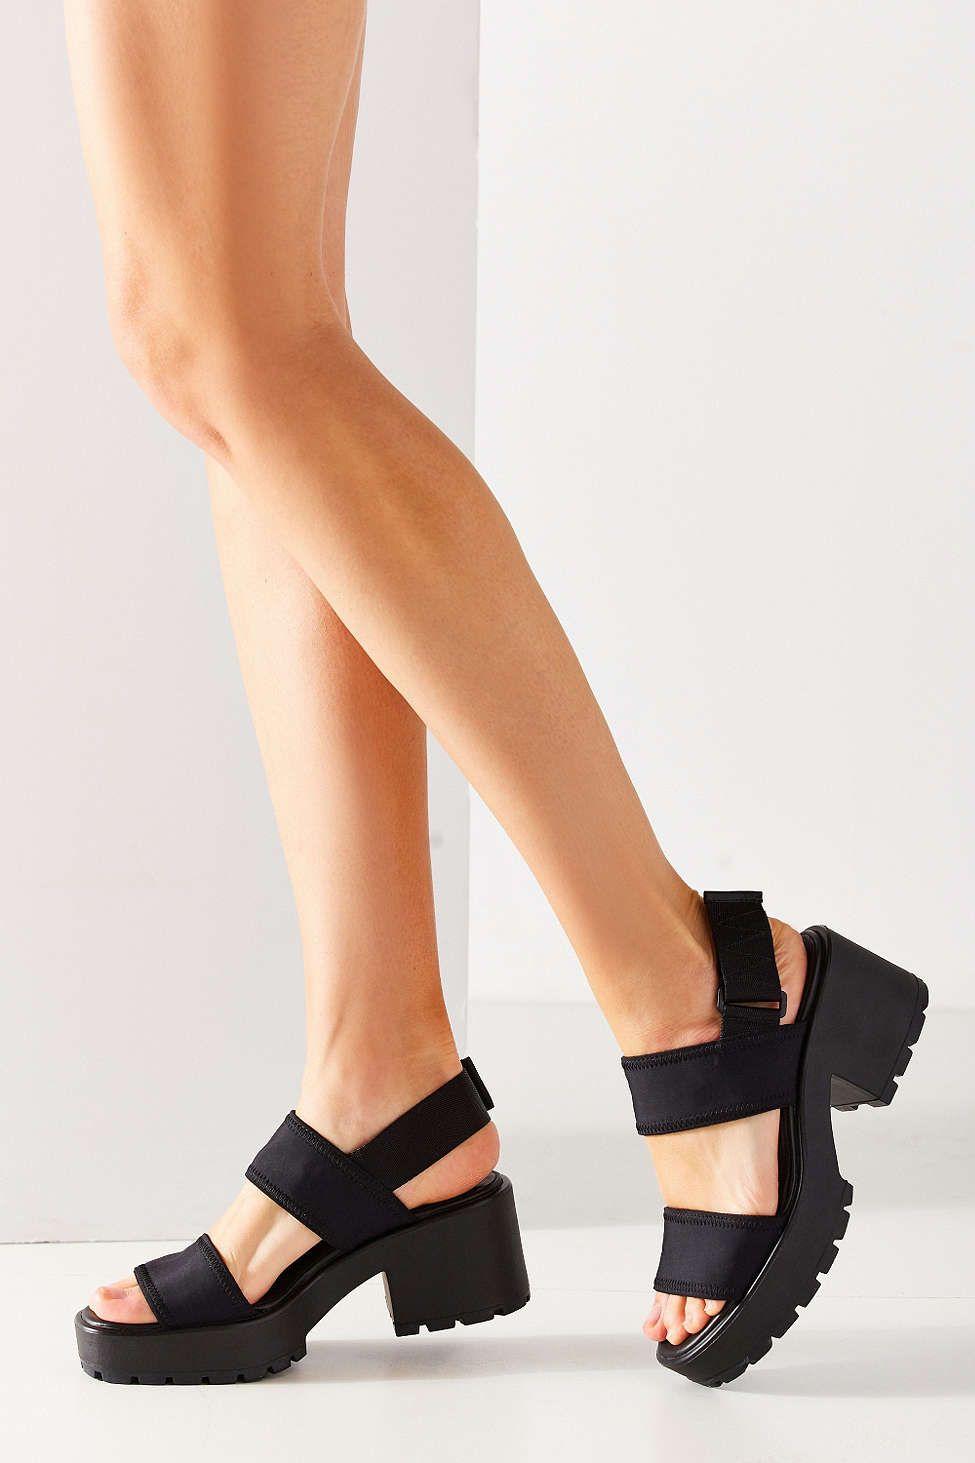 cc540be5c05b Shoes on Sale for Women. Vagabond Dioon Sandal